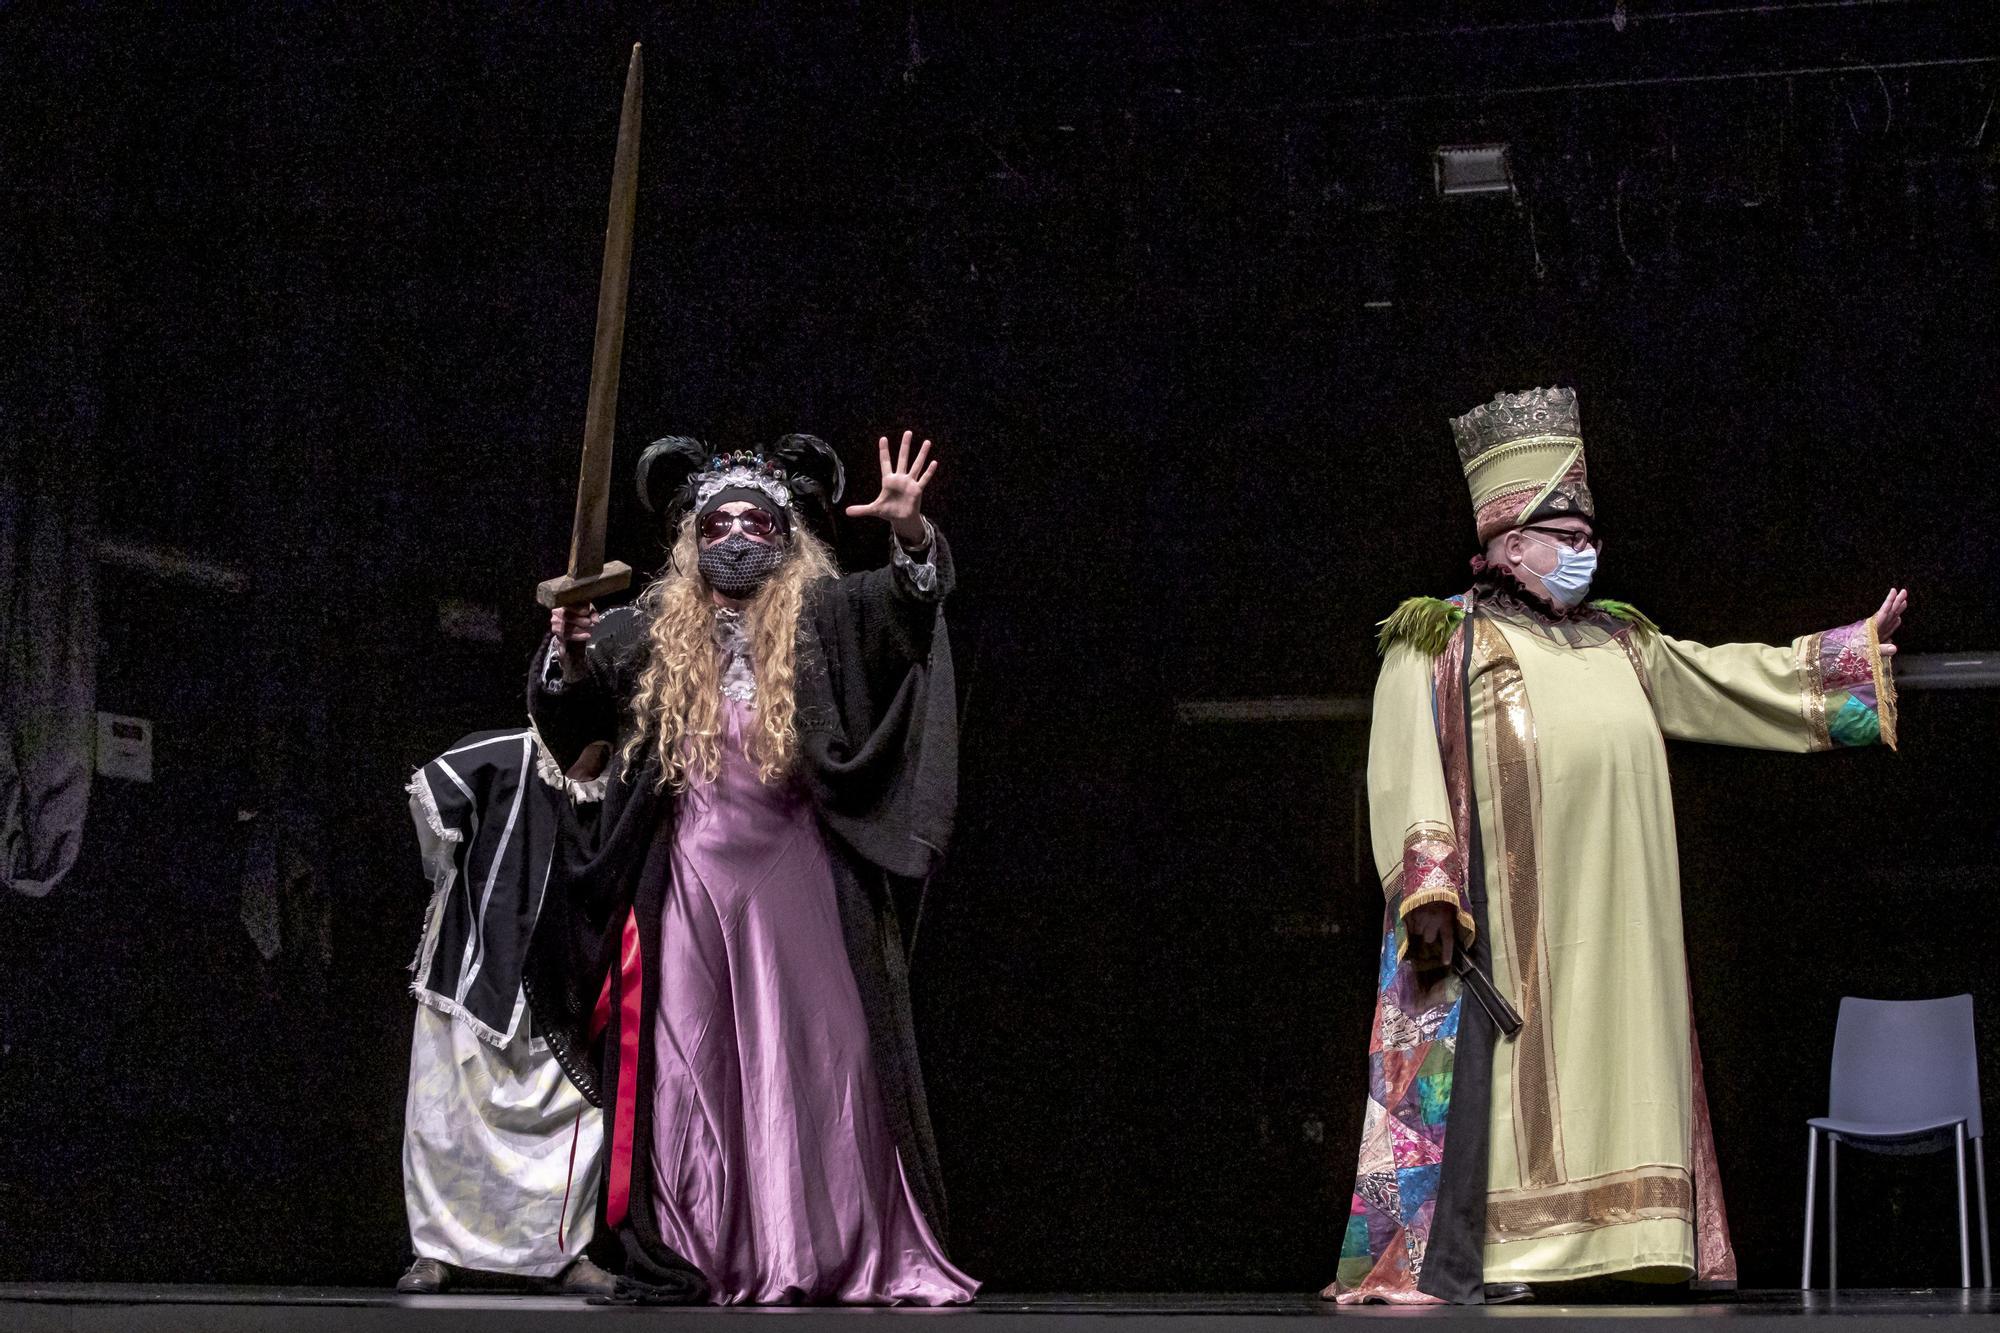 'L'Adoració dels Tres Reis d'Orient' promete morcillas para políticos y pandemia